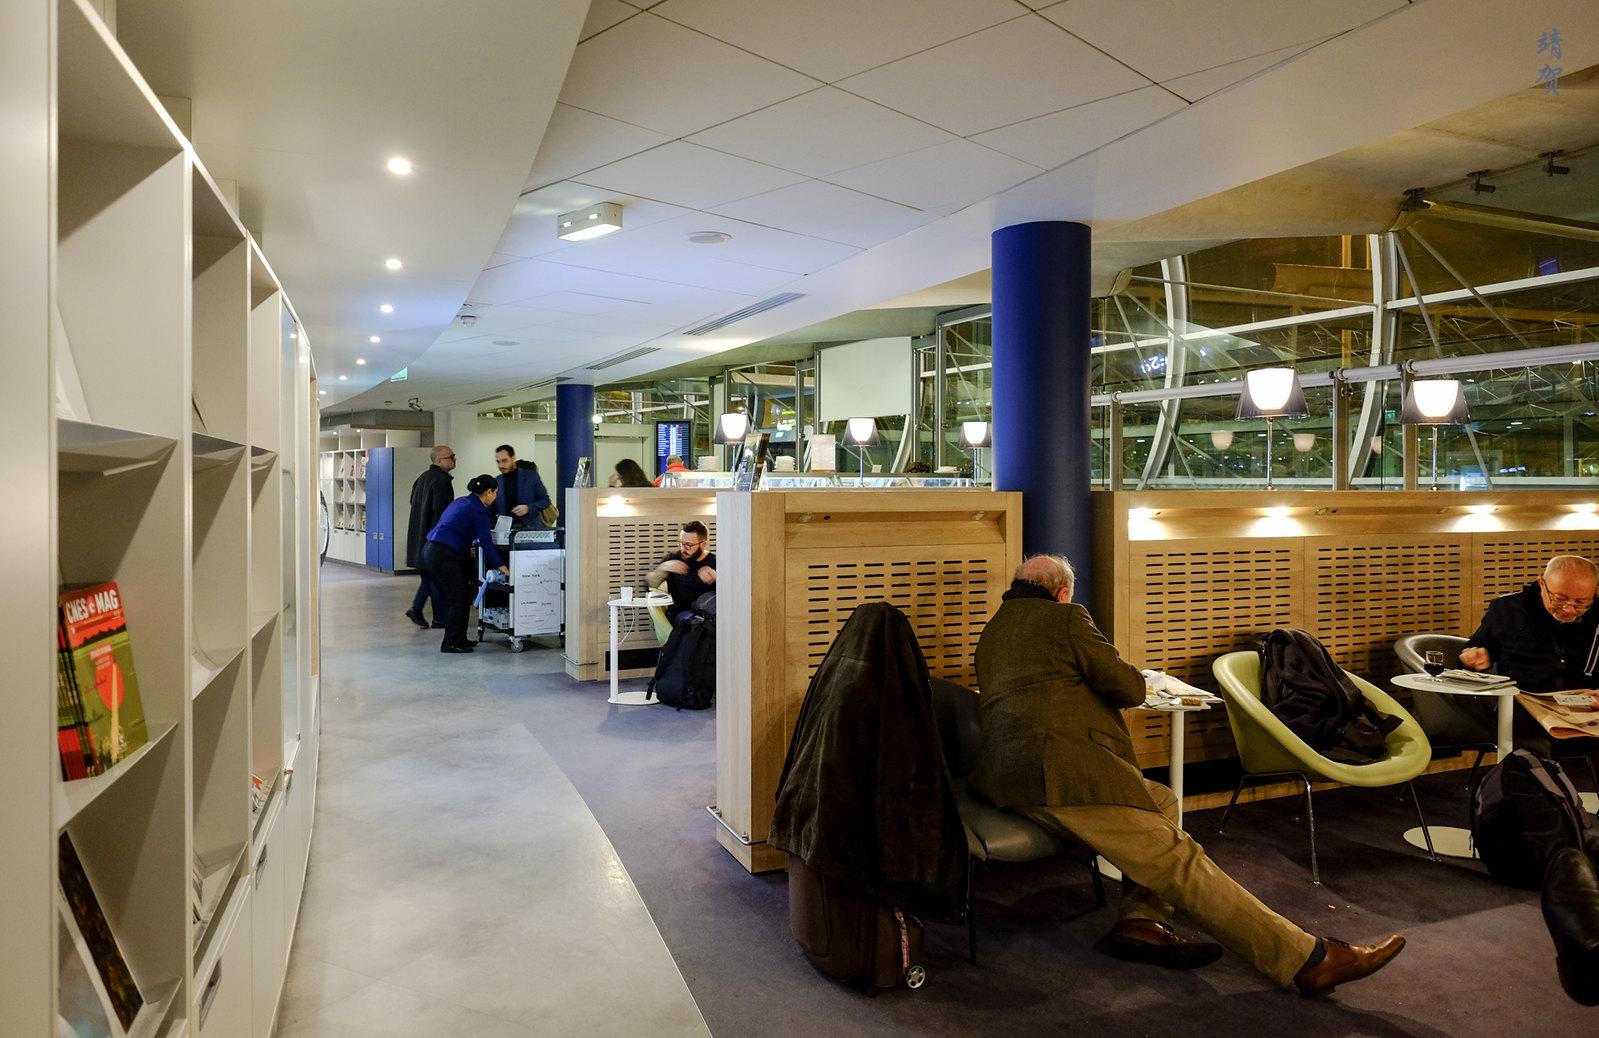 Corridors in the lounge